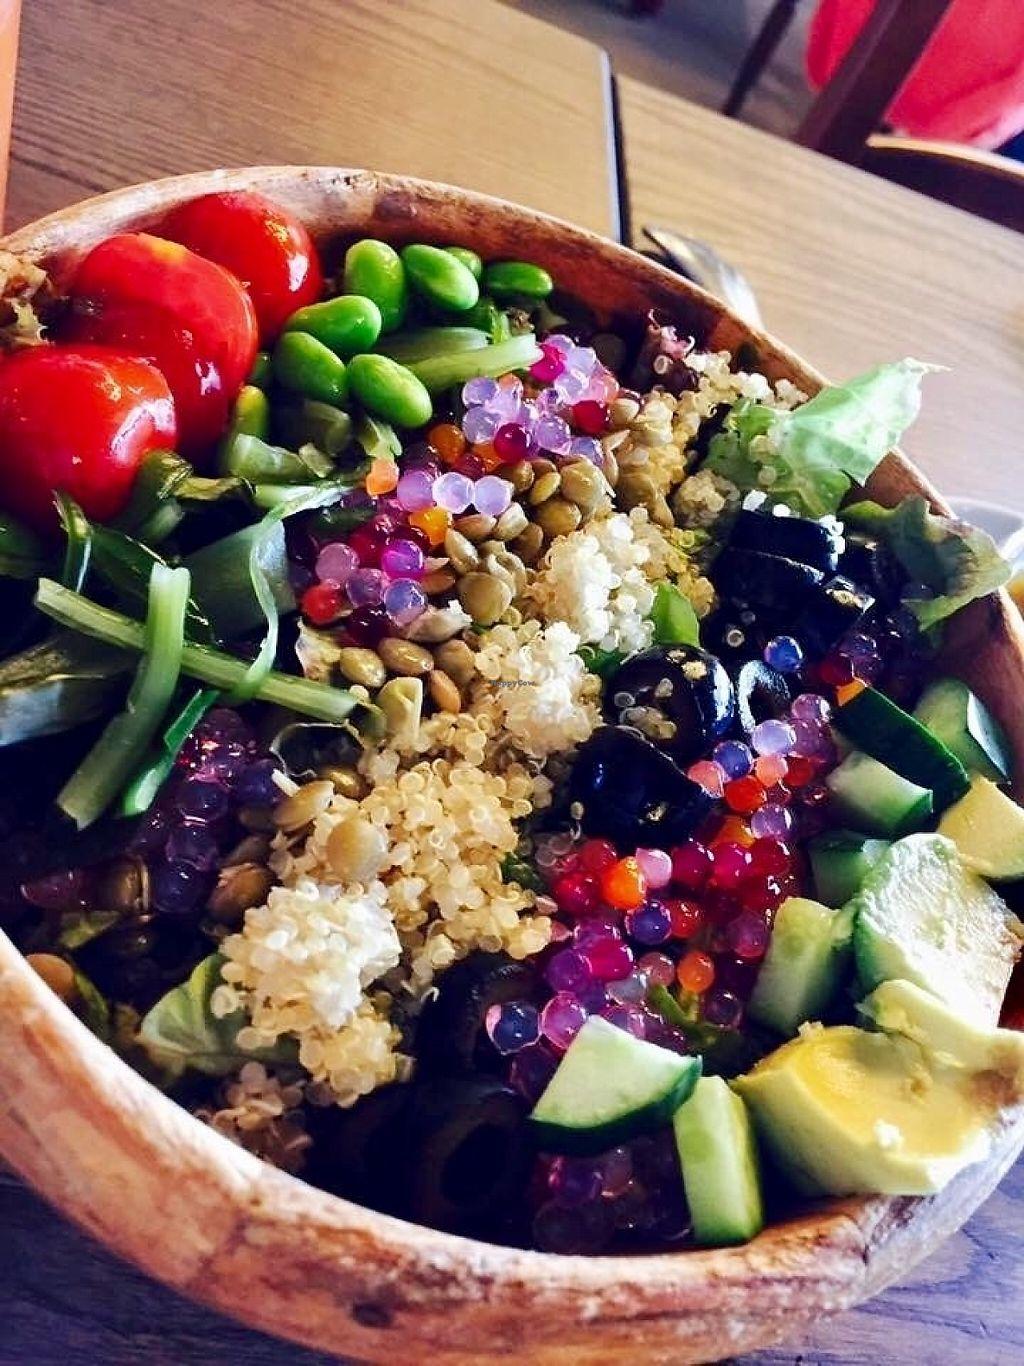 "Photo of Cafe La Boheme - Sakura-Shinmachi  by <a href=""/members/profile/paulkates"">paulkates</a> <br/>Vegan tofu salad <br/> June 7, 2017  - <a href='/contact/abuse/image/93491/266533'>Report</a>"